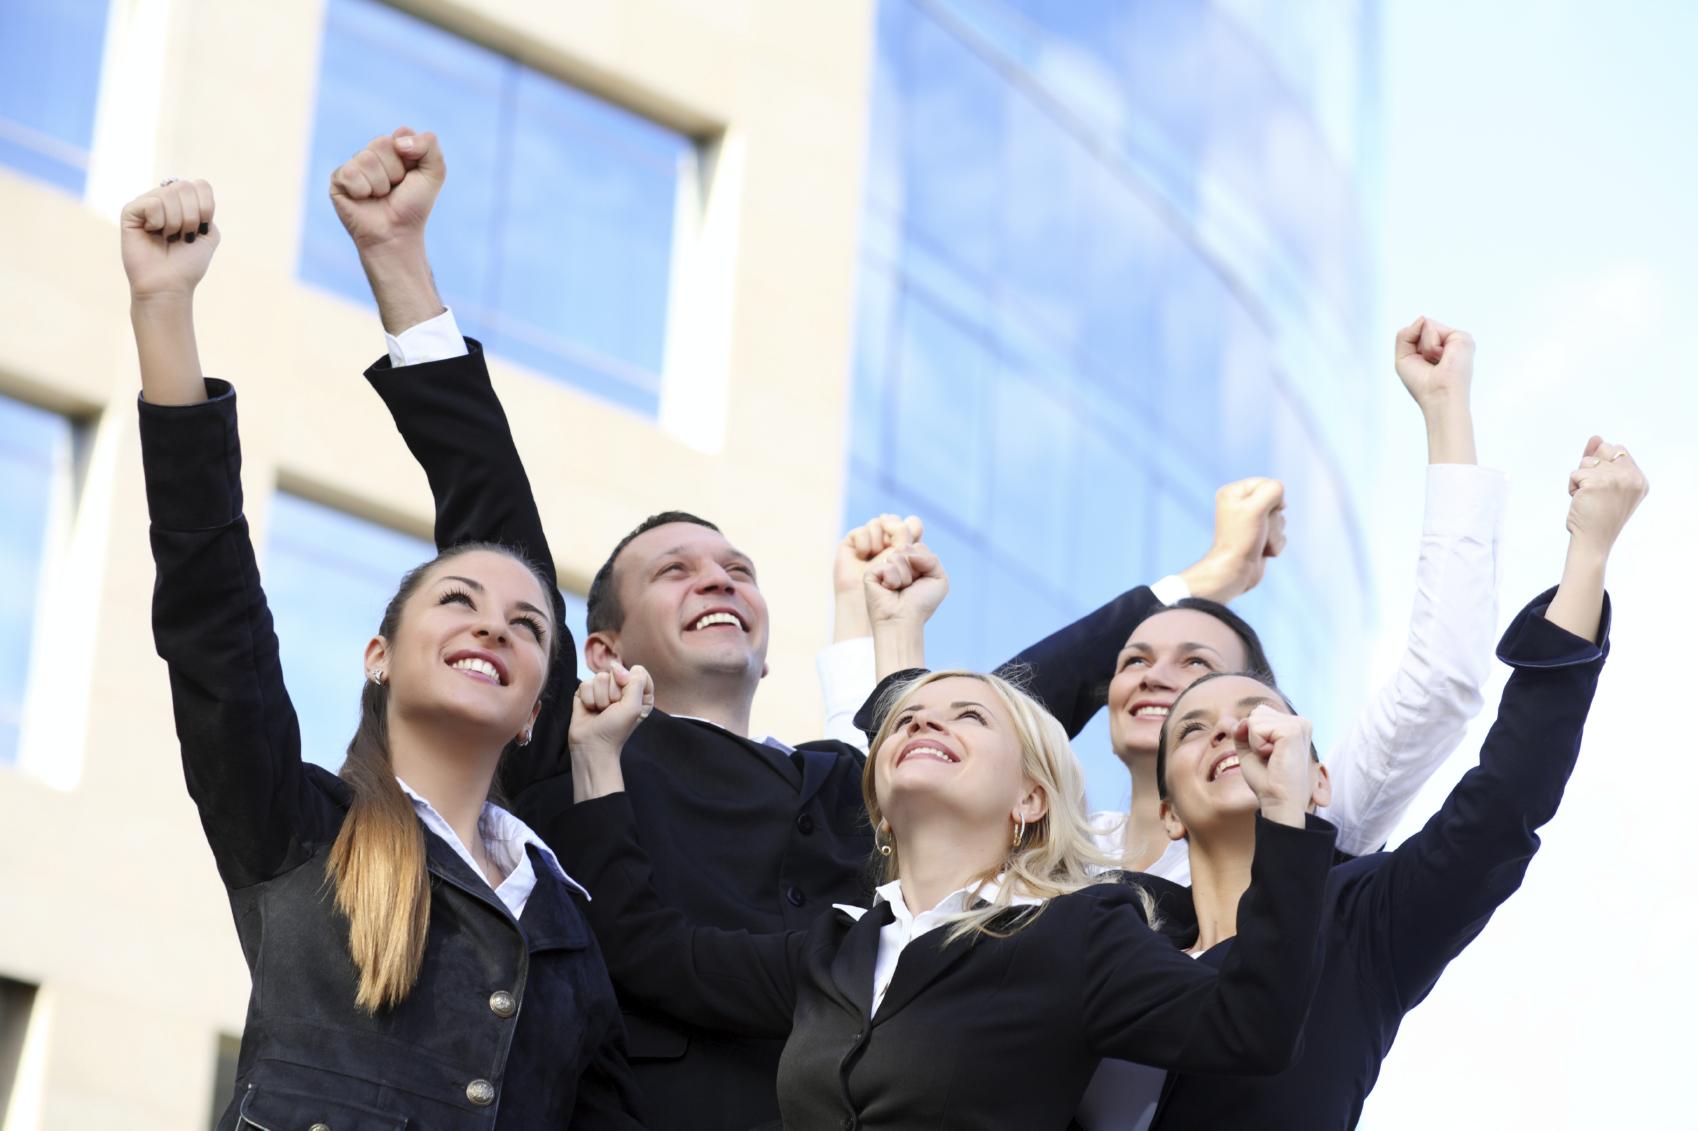 Successful businesspeople raising hands upward.